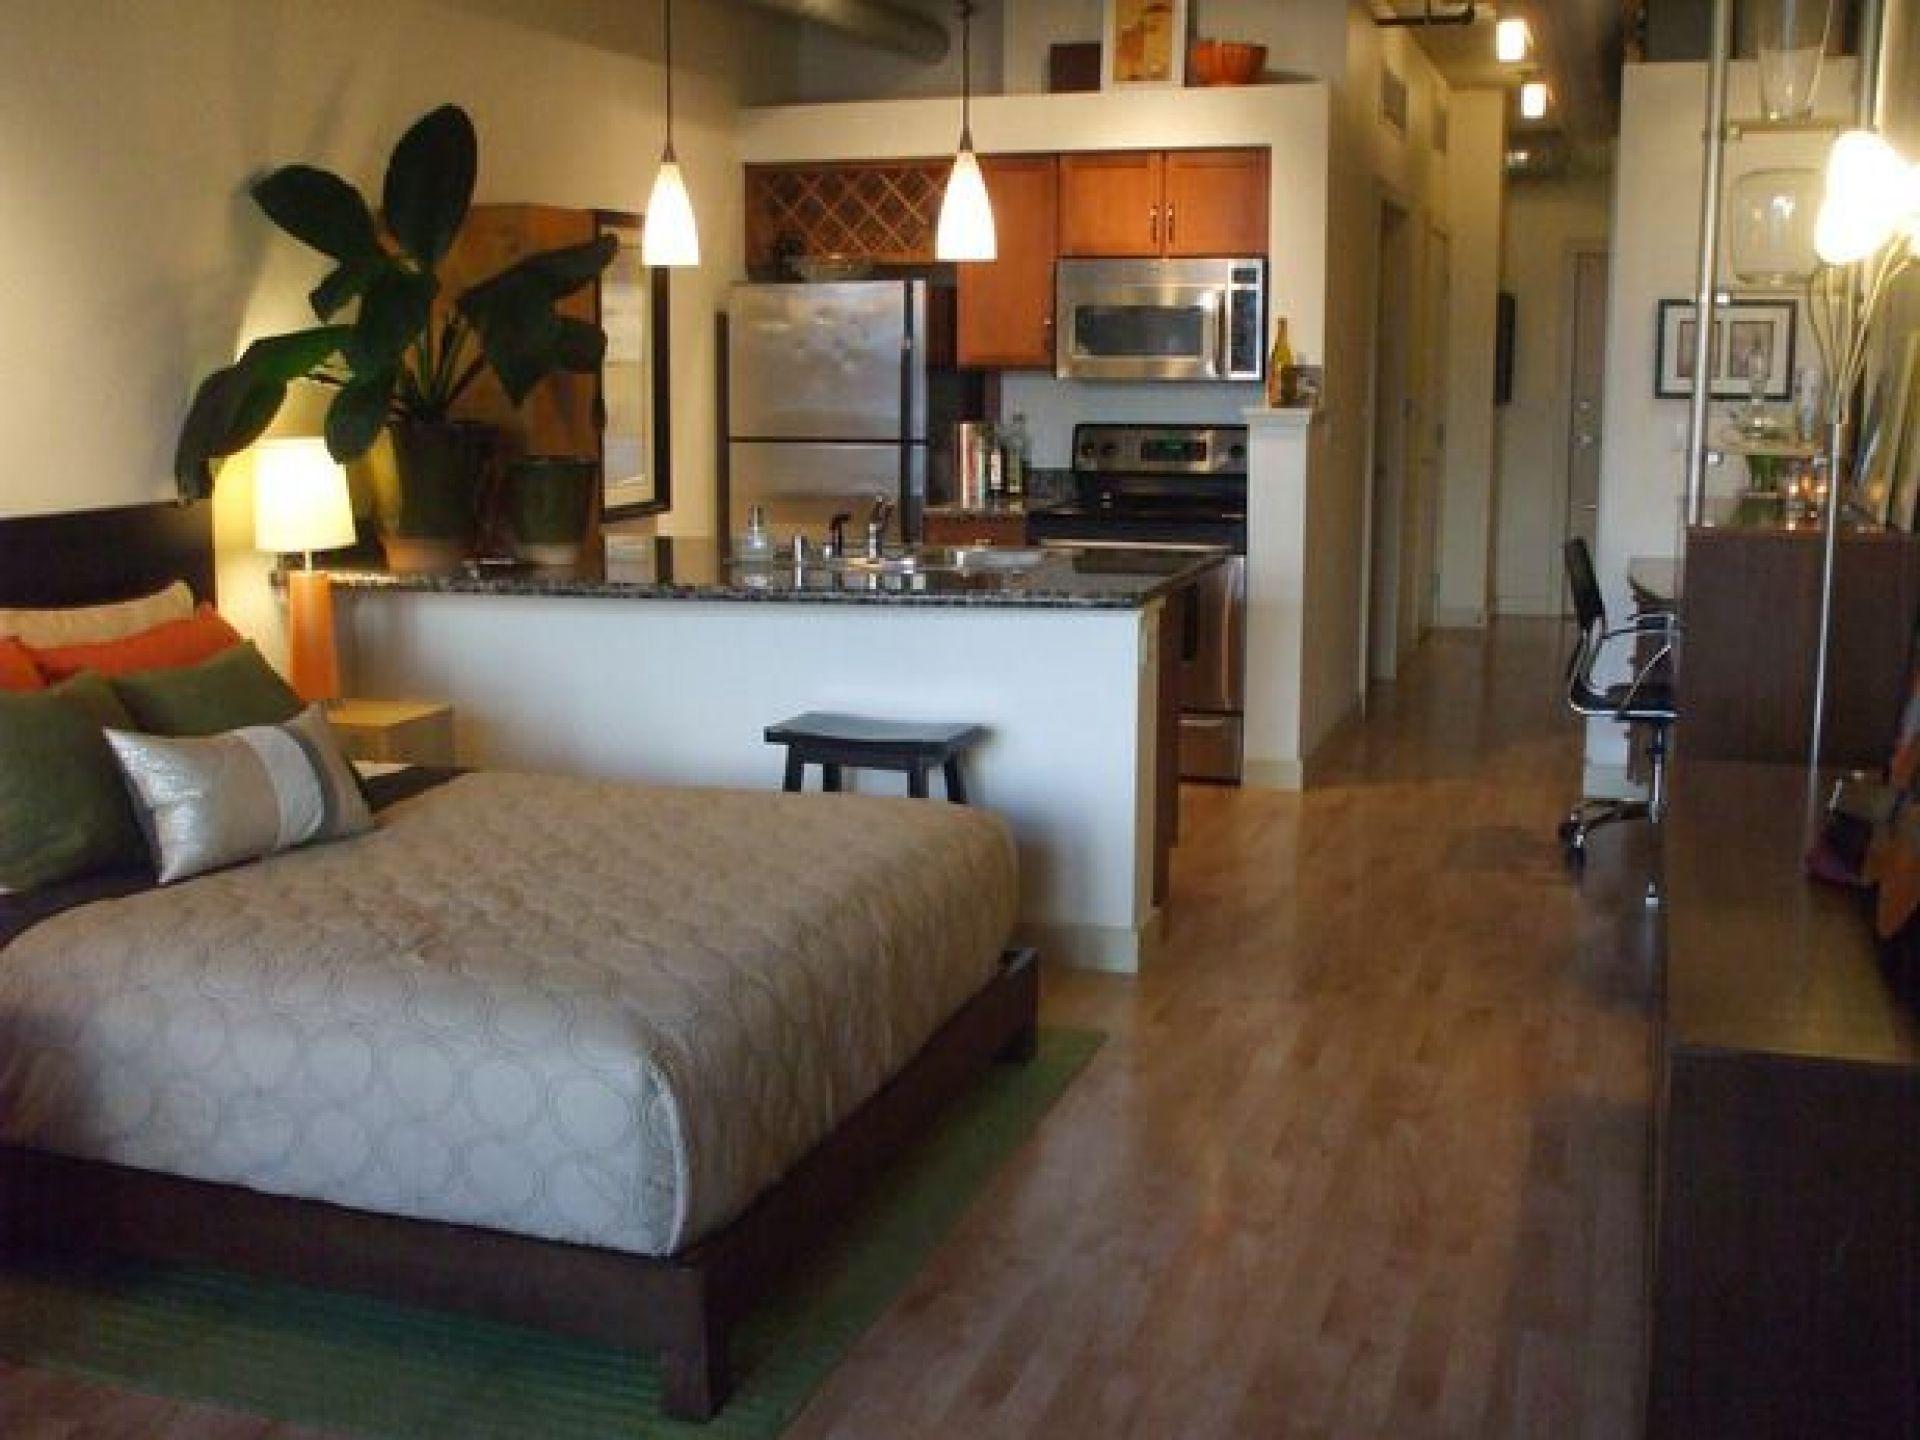 sleek and modern studio apartment designs - Google Search | Studio ...